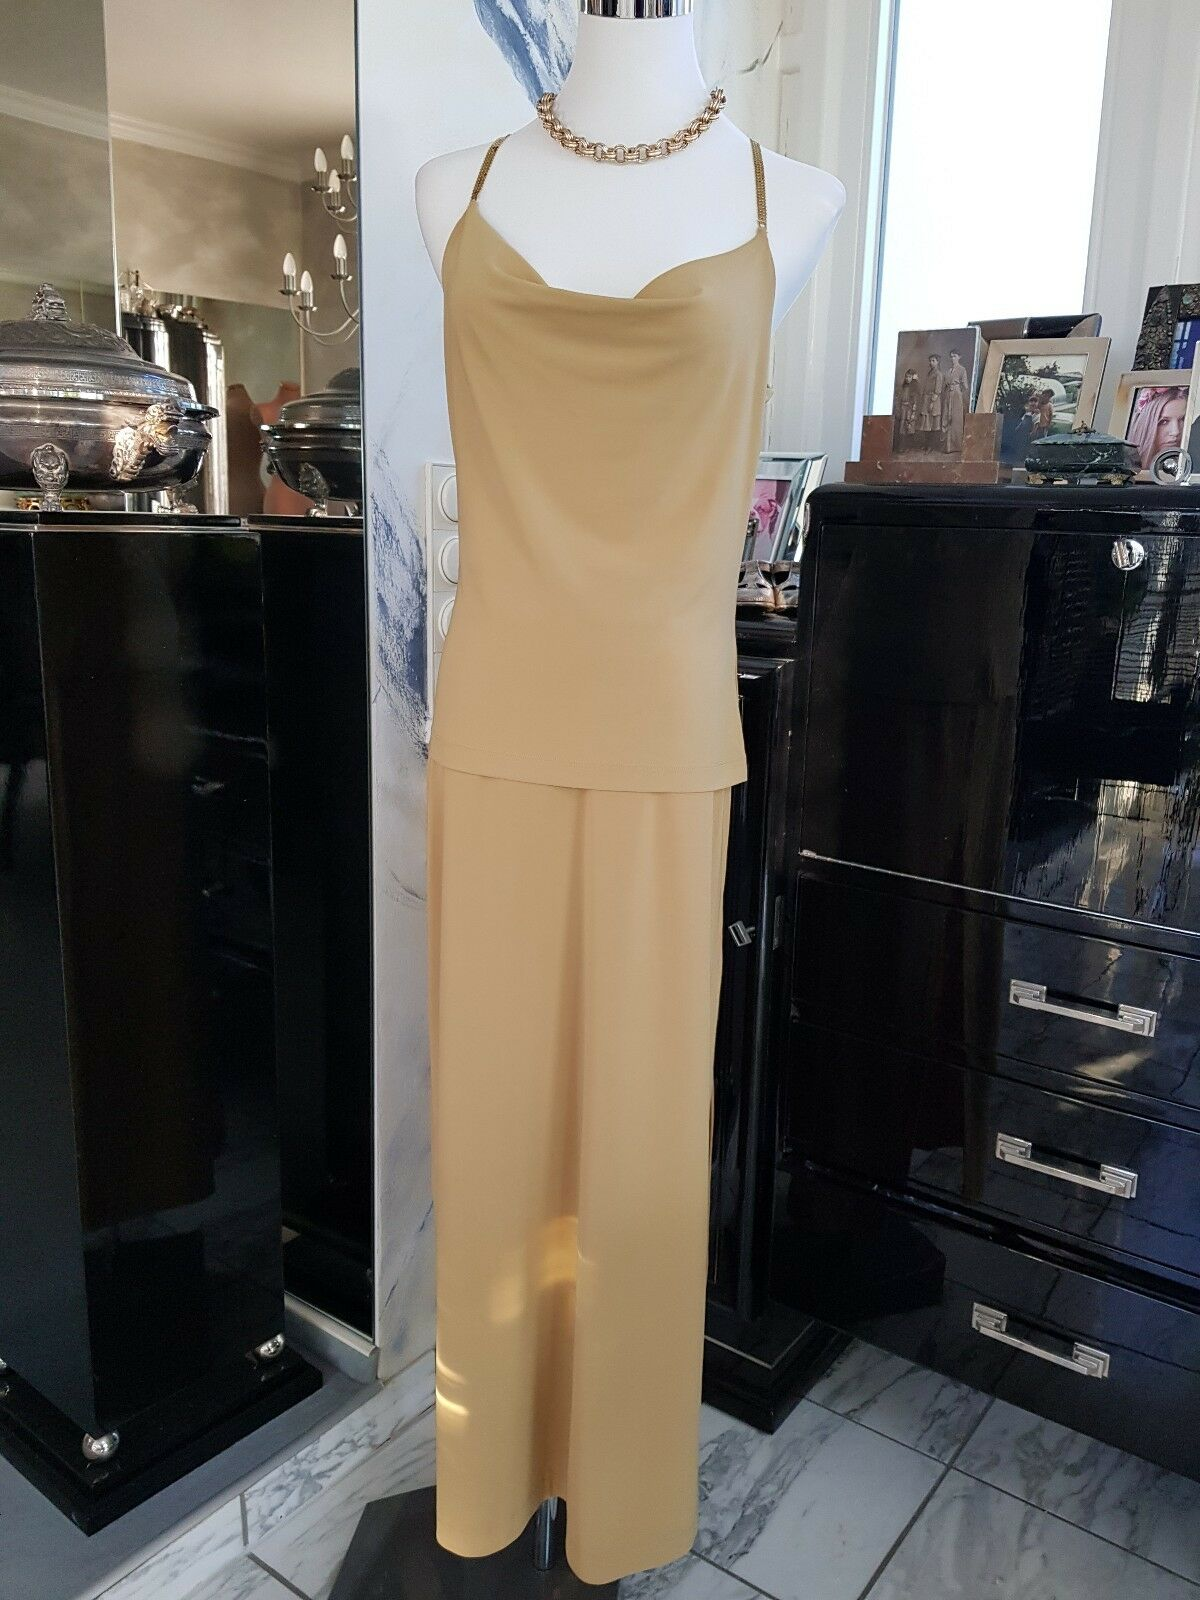 b7b1572e7f34 PLEIN SUD Abendkleid Gr. Gr. Gr. DE 36 38 cremebeige Damen Dress 2 ...